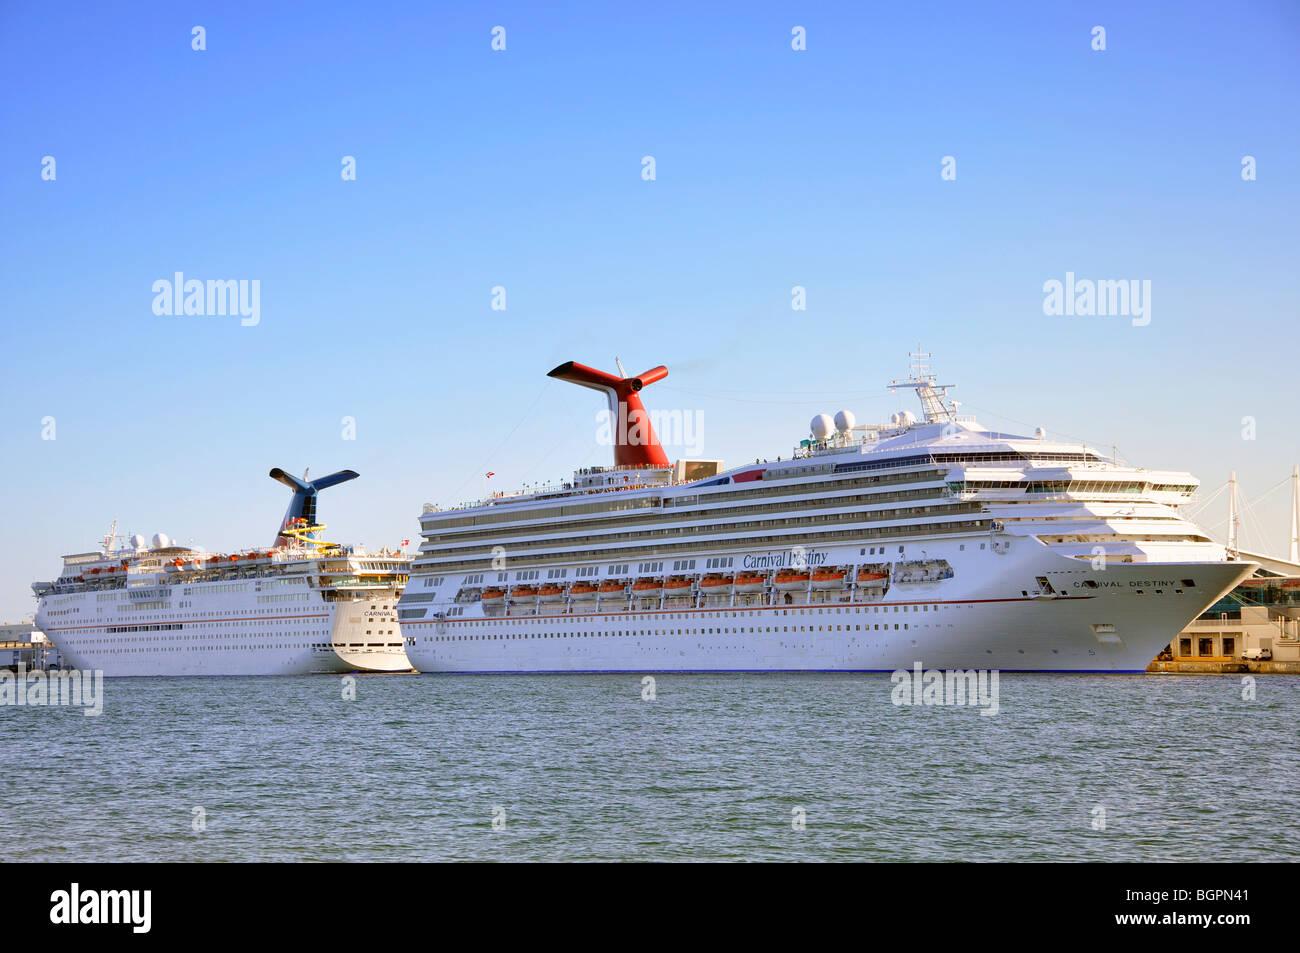 Cruise ships, Miami, Florida, USA - Stock Image